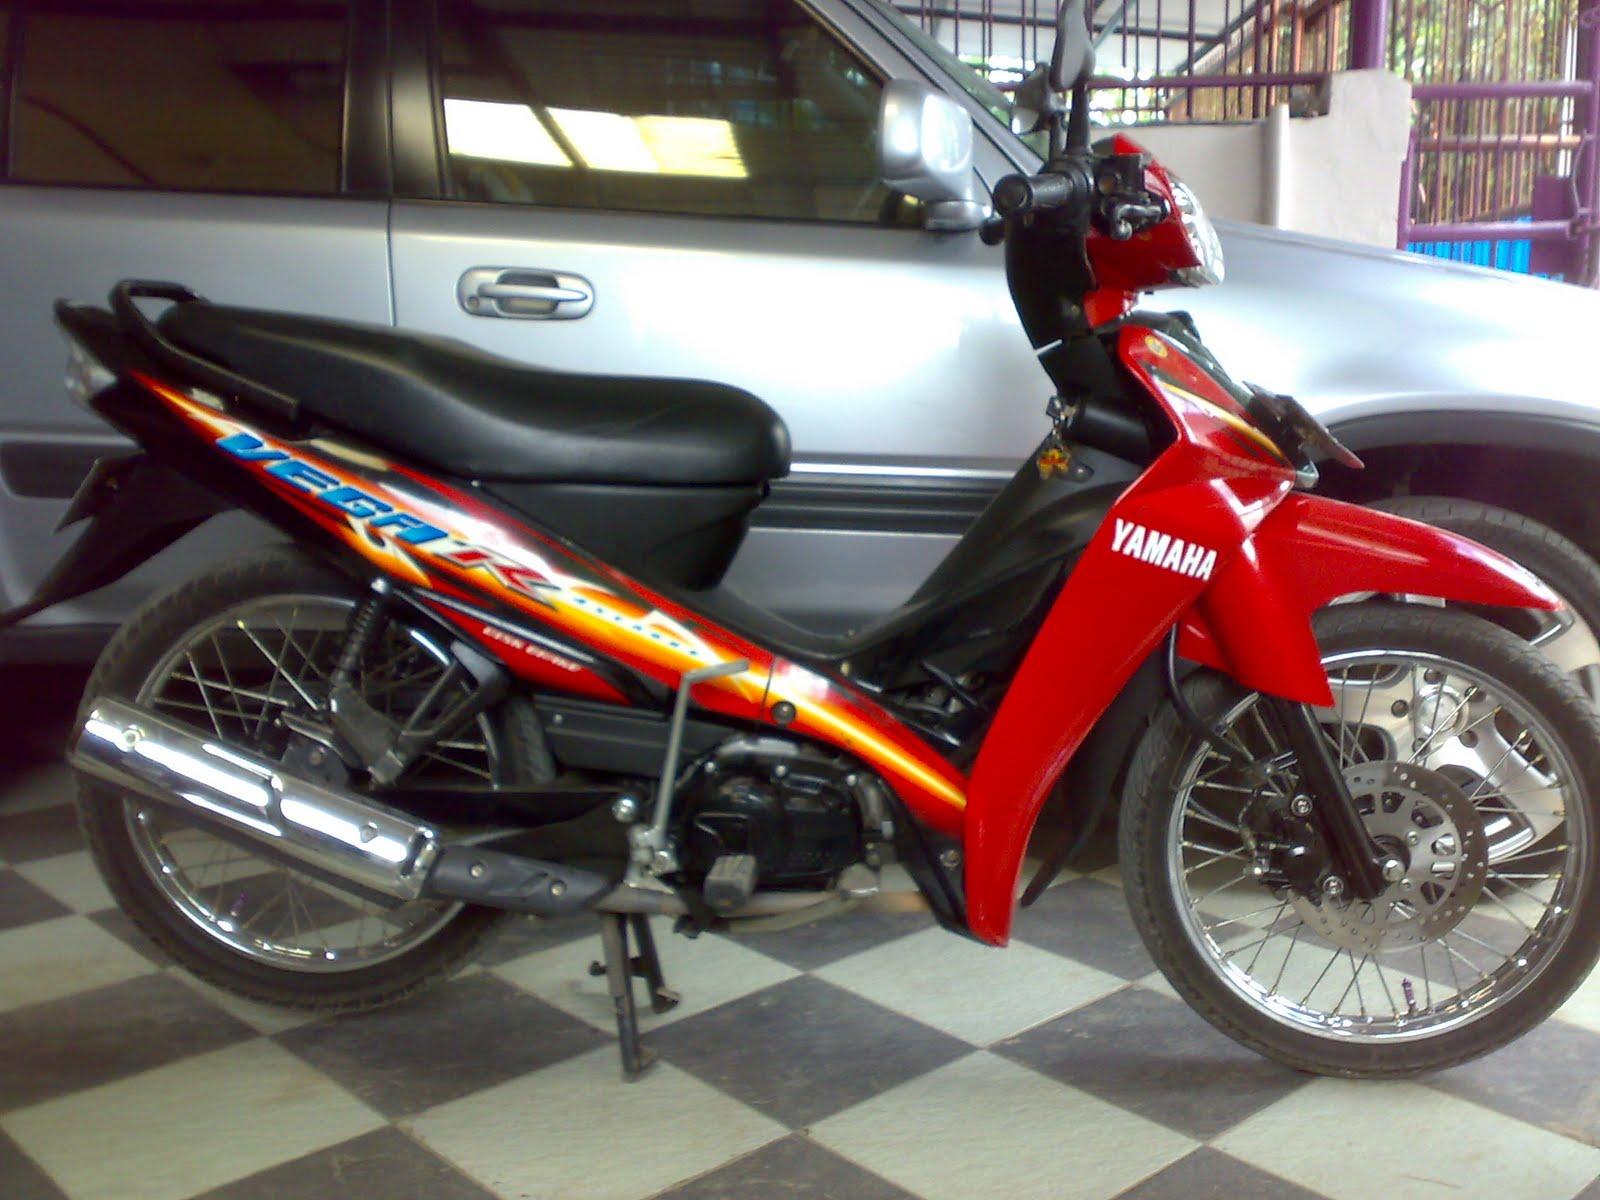 Foto Yamaha Vega R Modif Eaton Br Type 15 20 Amp Singlepole Bd Tandem Circuit Breakerbd1520